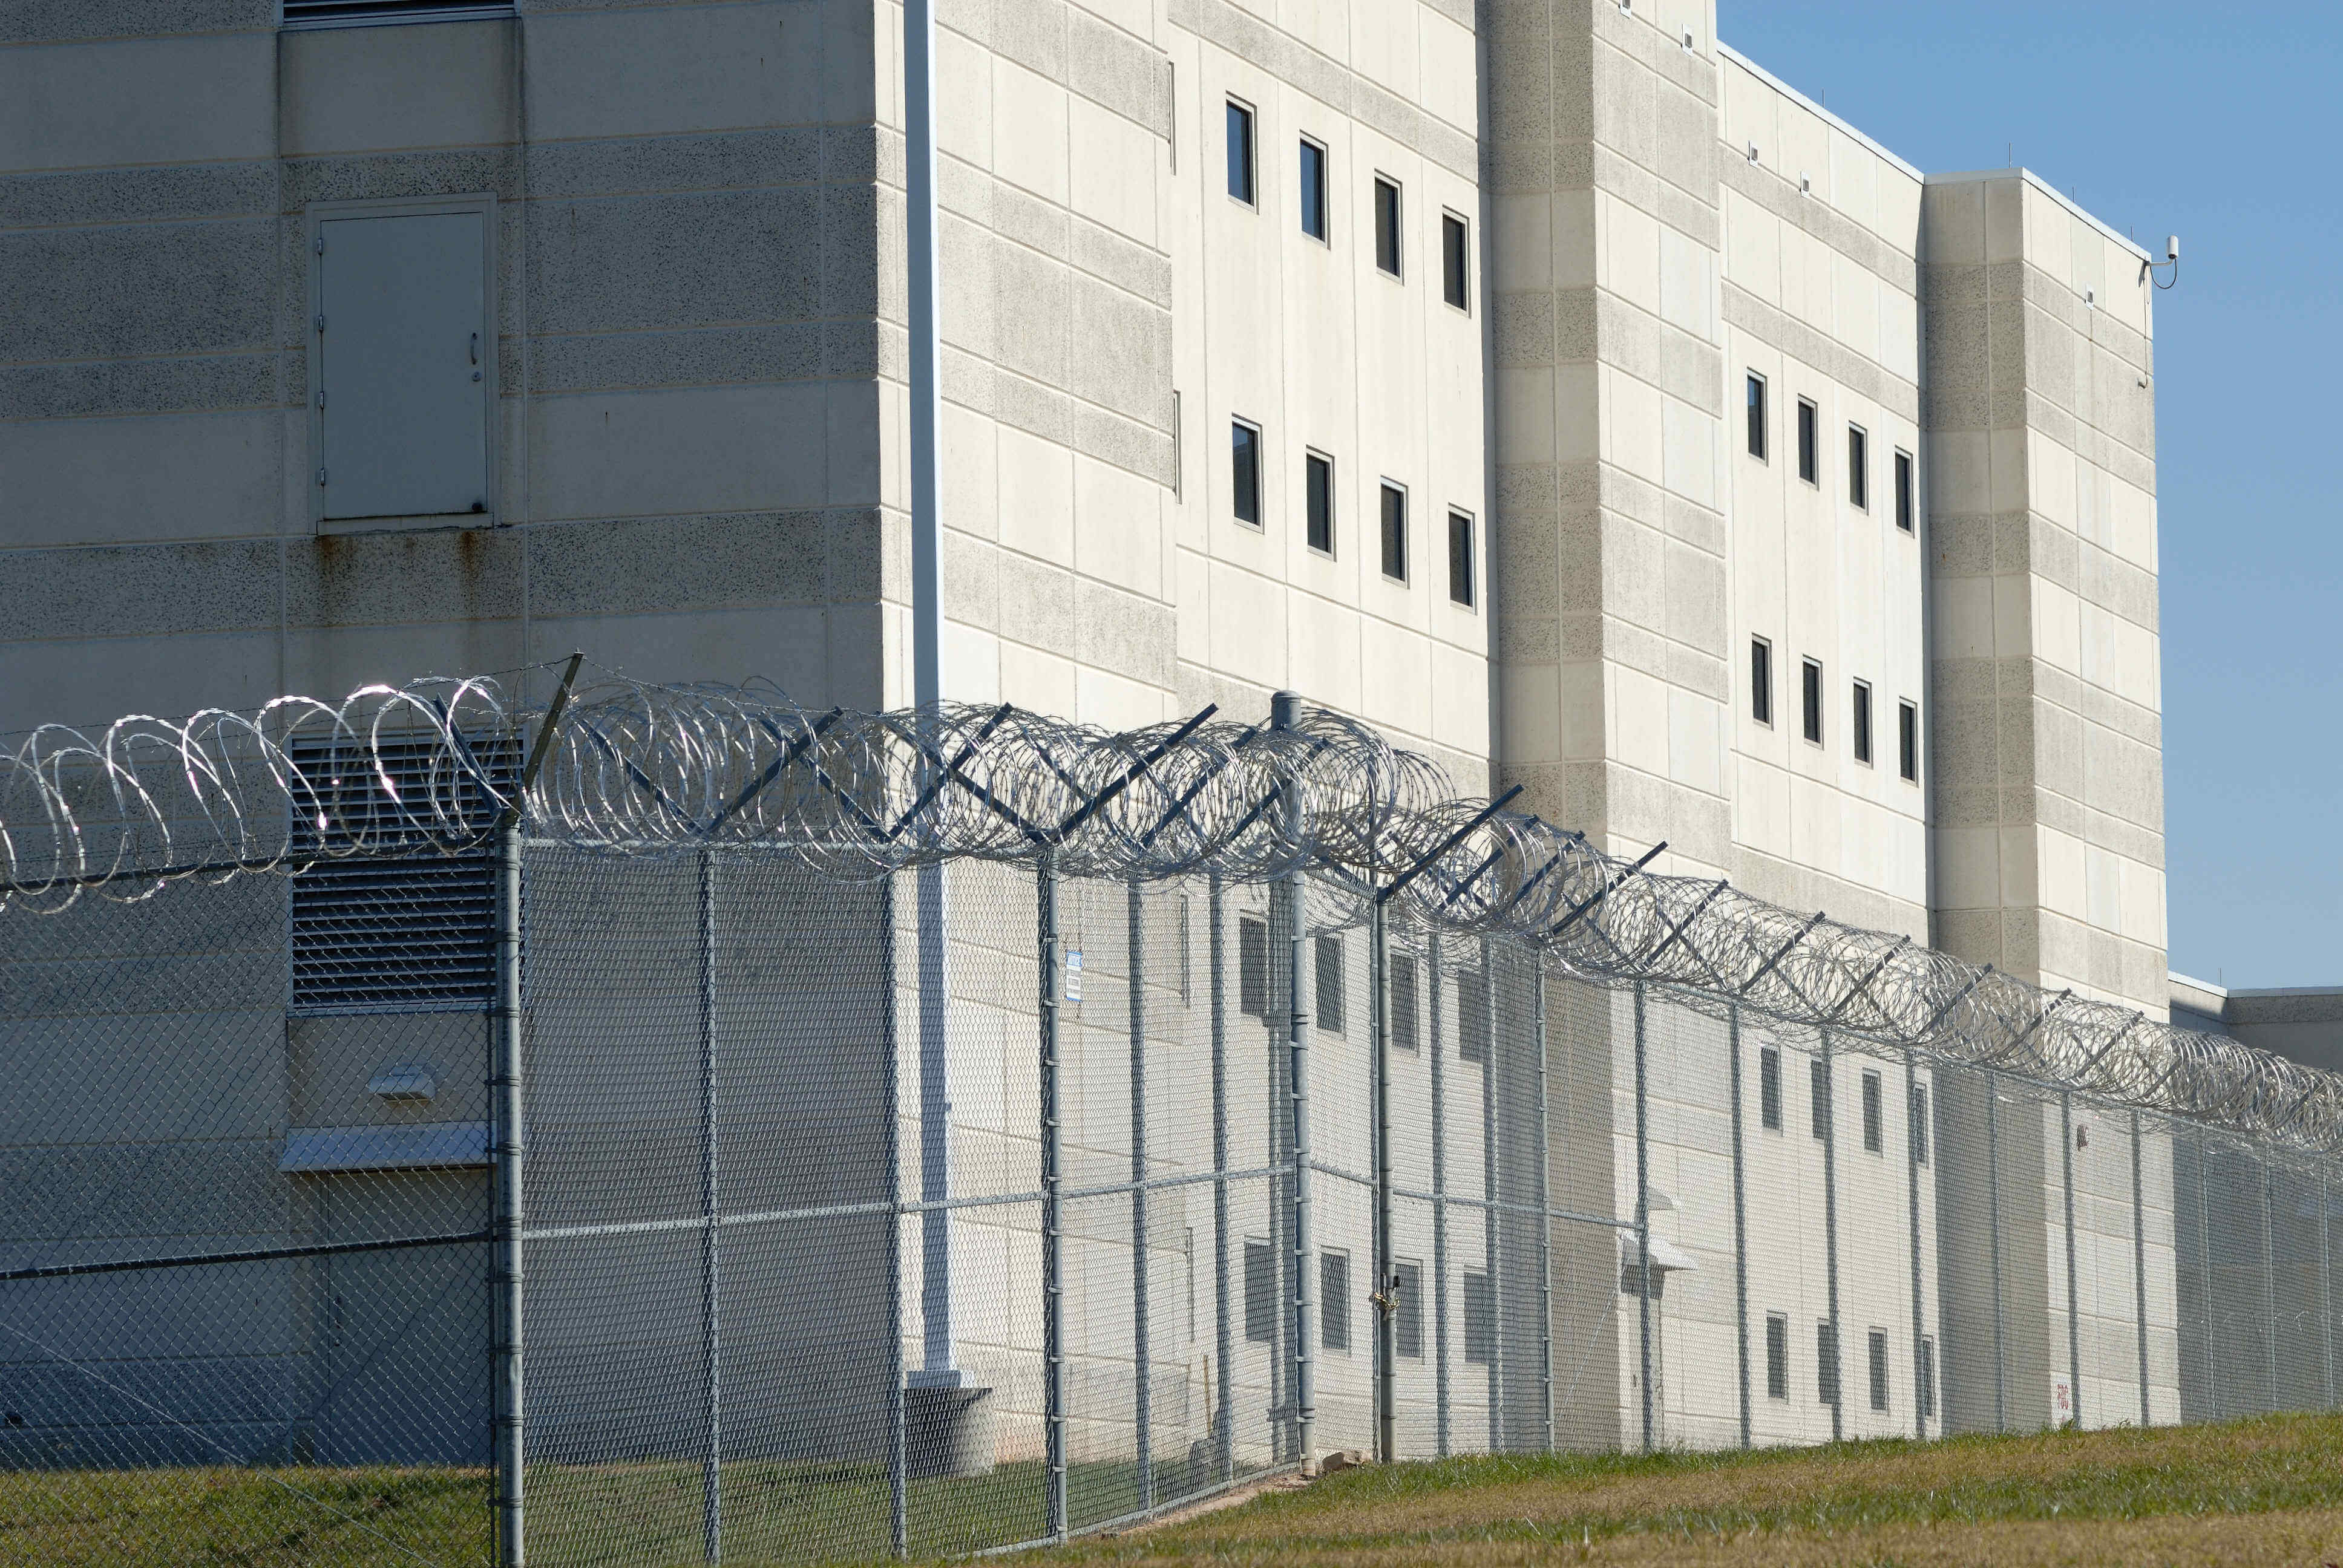 Prison PIDS